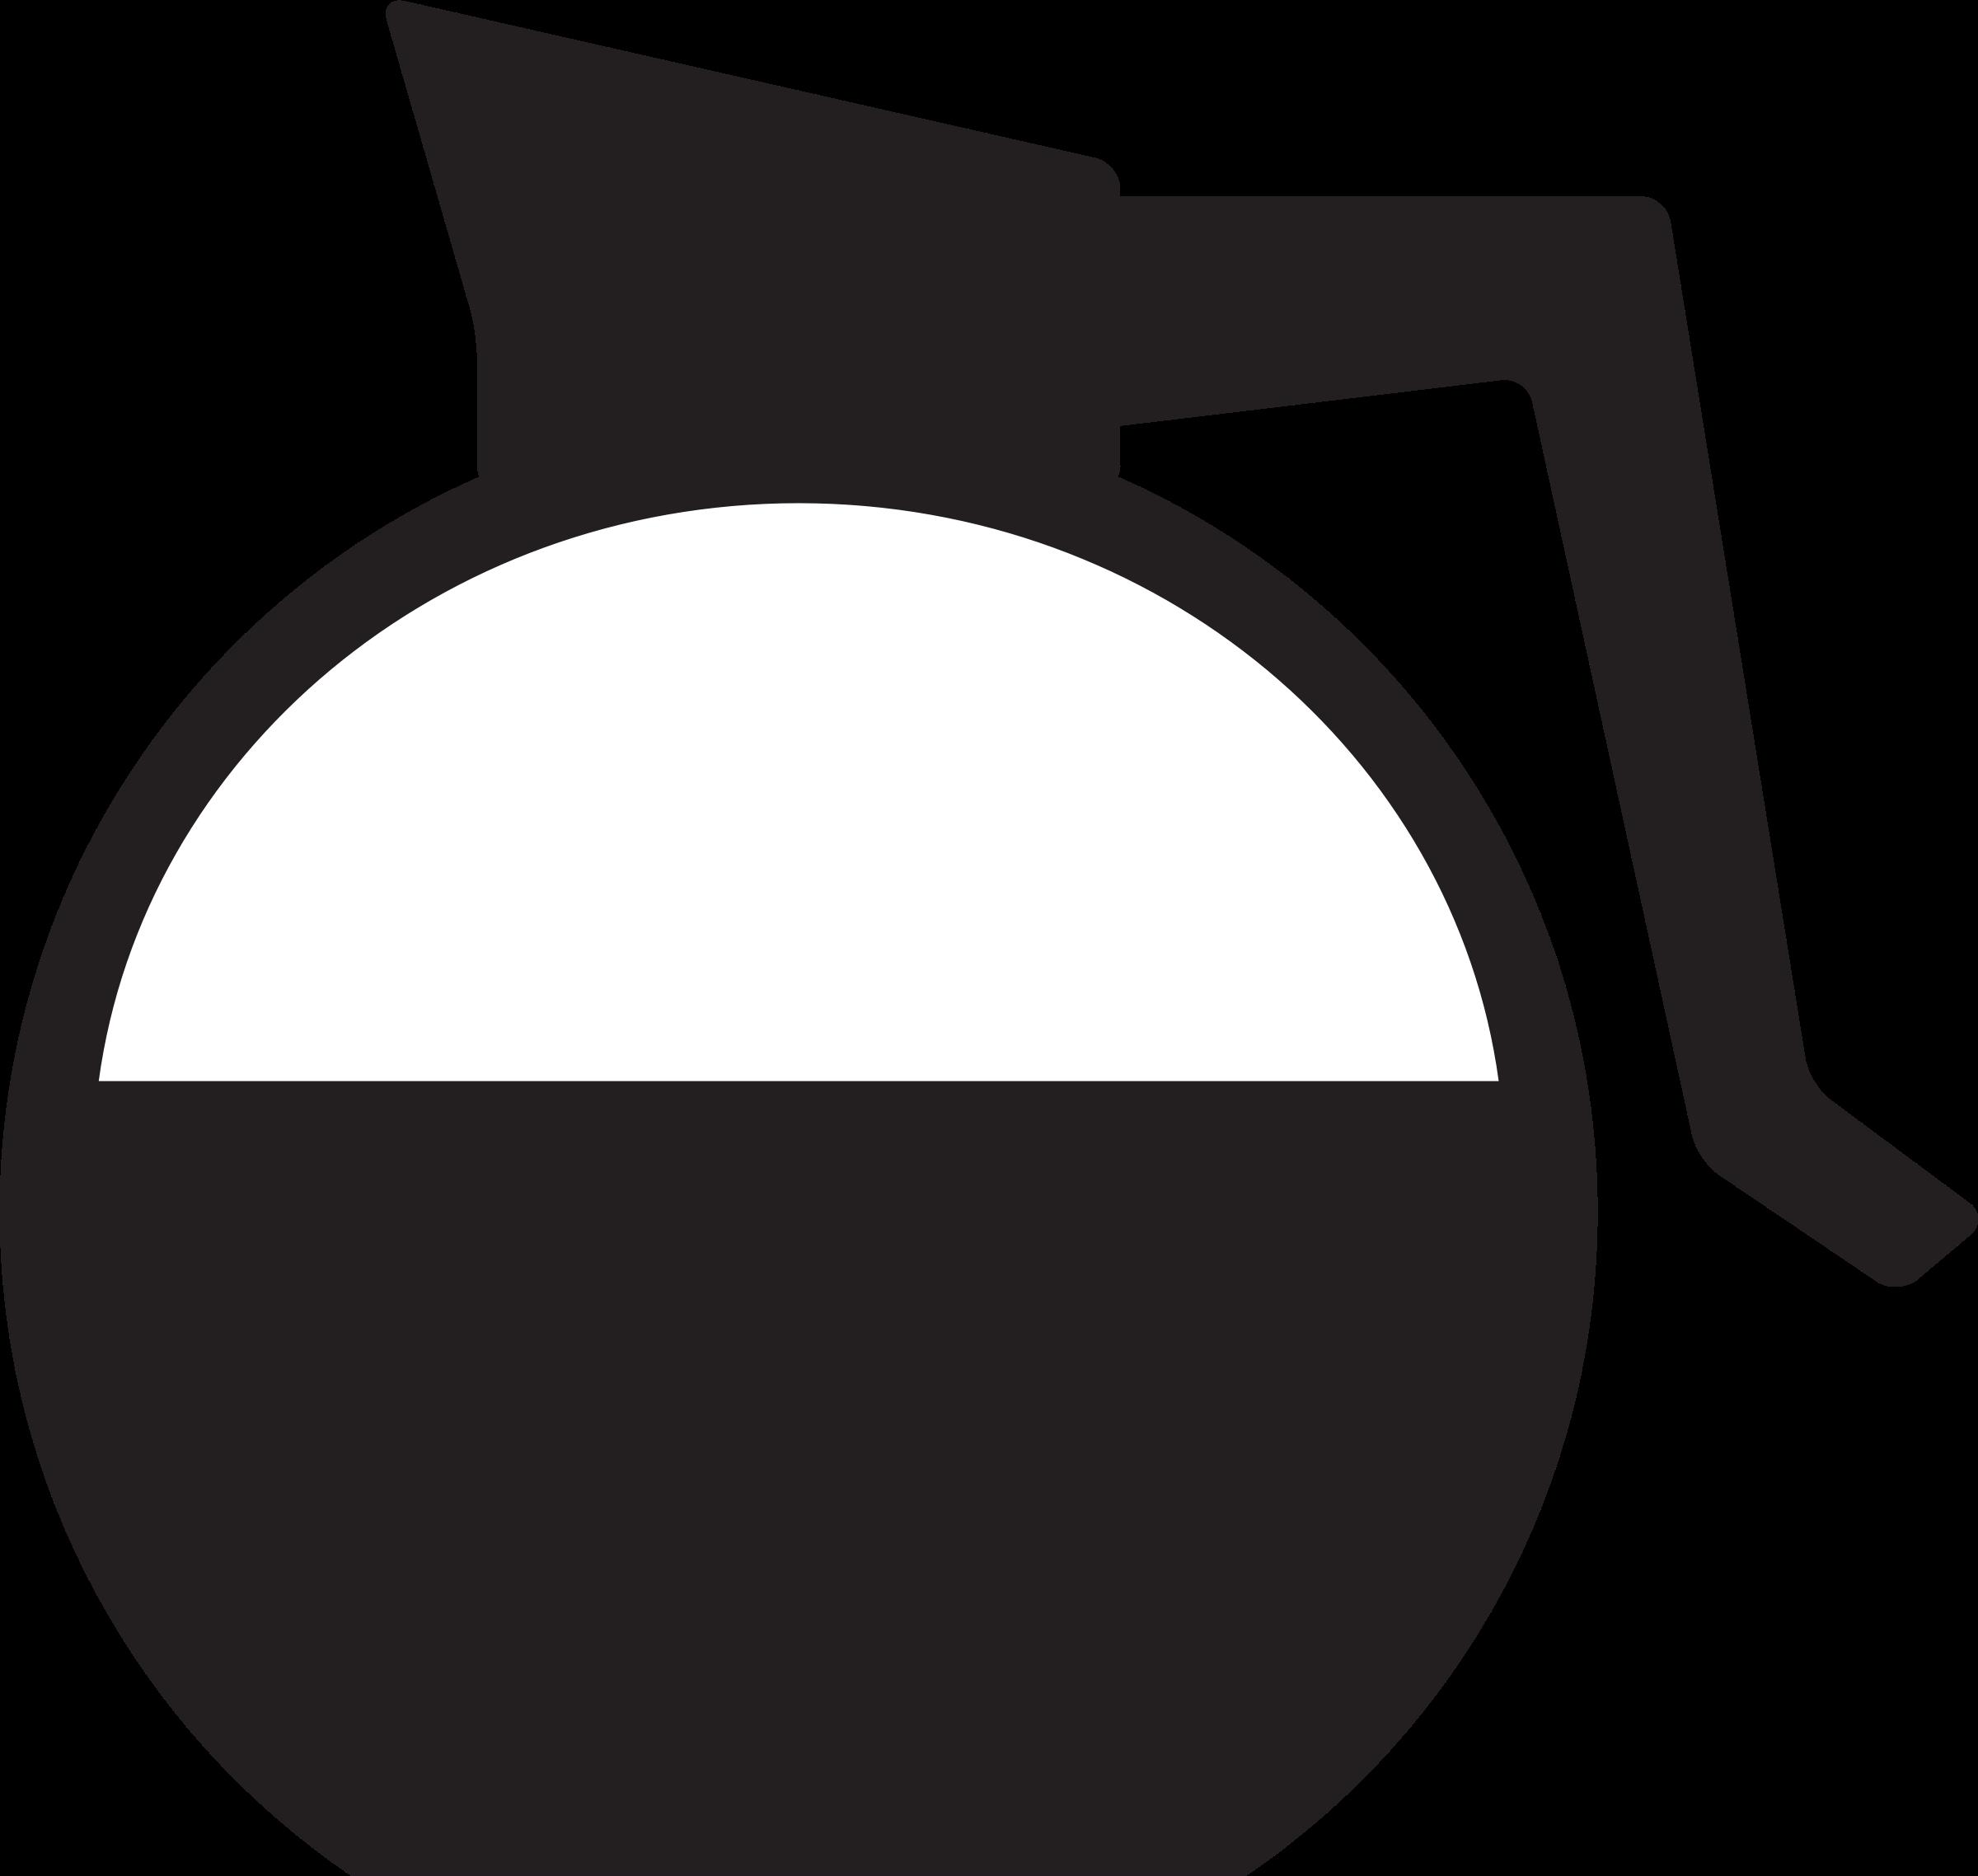 Clipart coffee icon. Kitchen drip carafe big